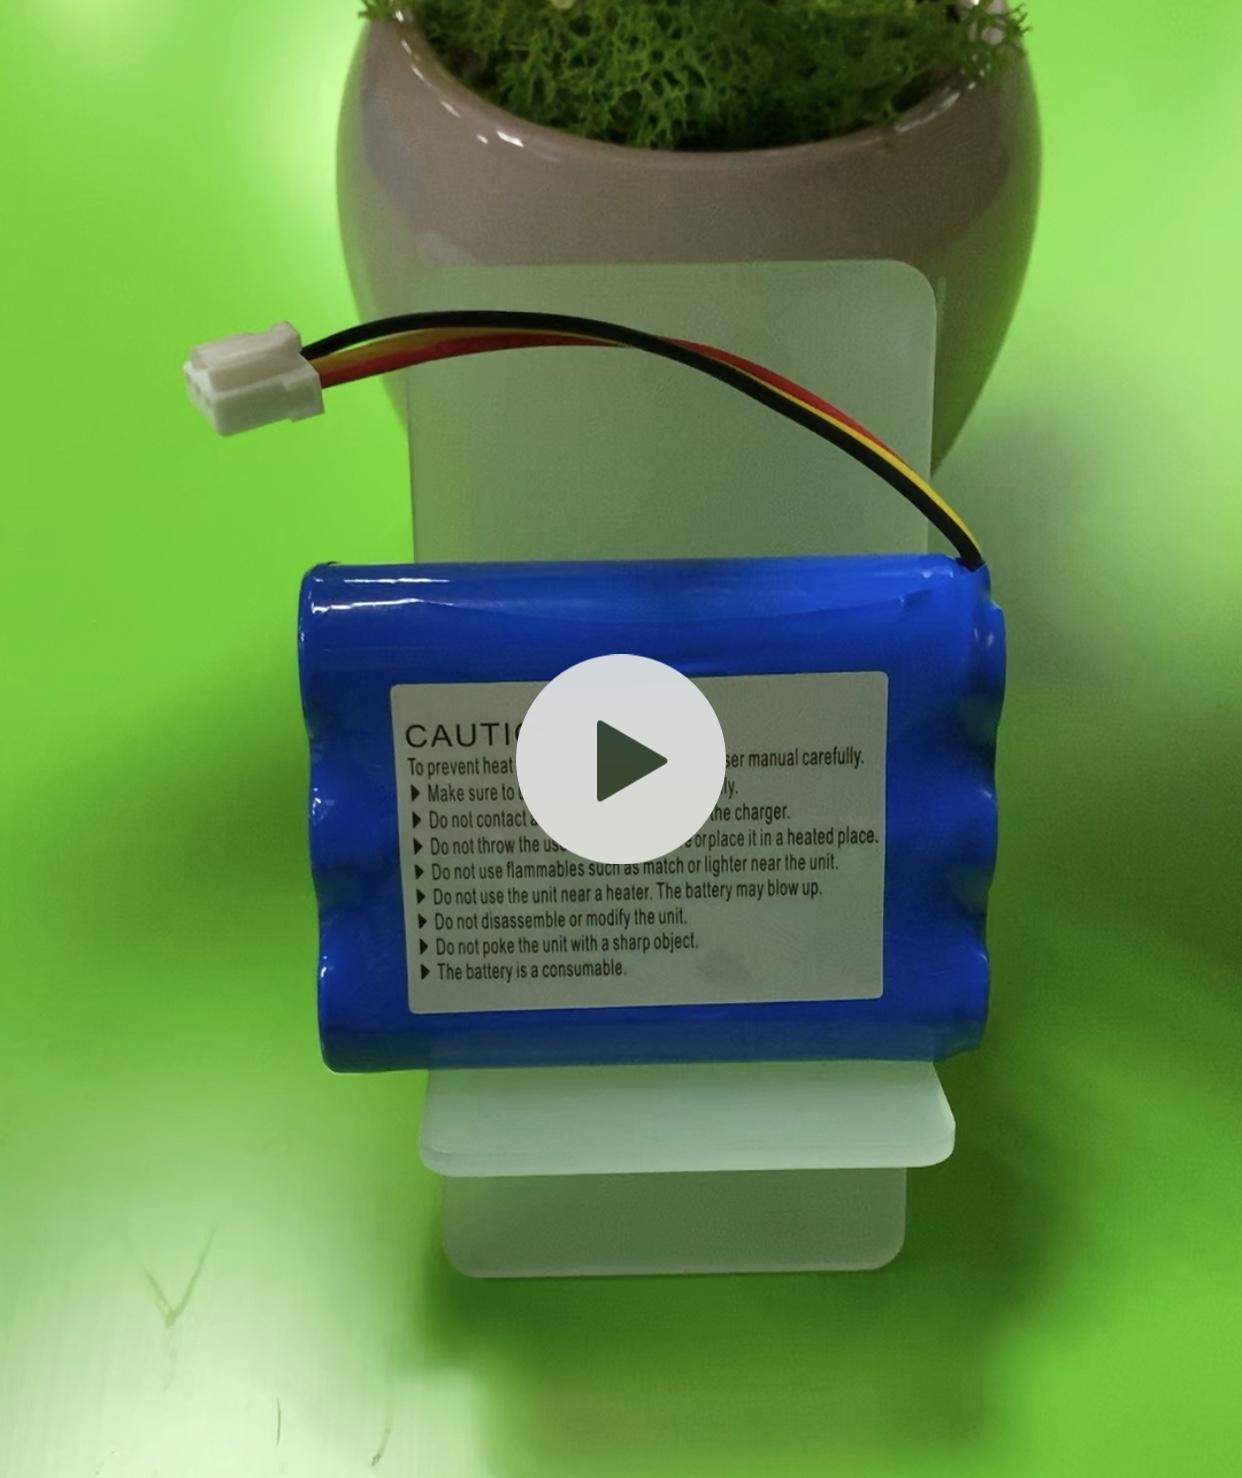 18650-3S 2200mAh 11.1V 1.5C KC 인증서가있는 원통형 리튬 이온 배터리